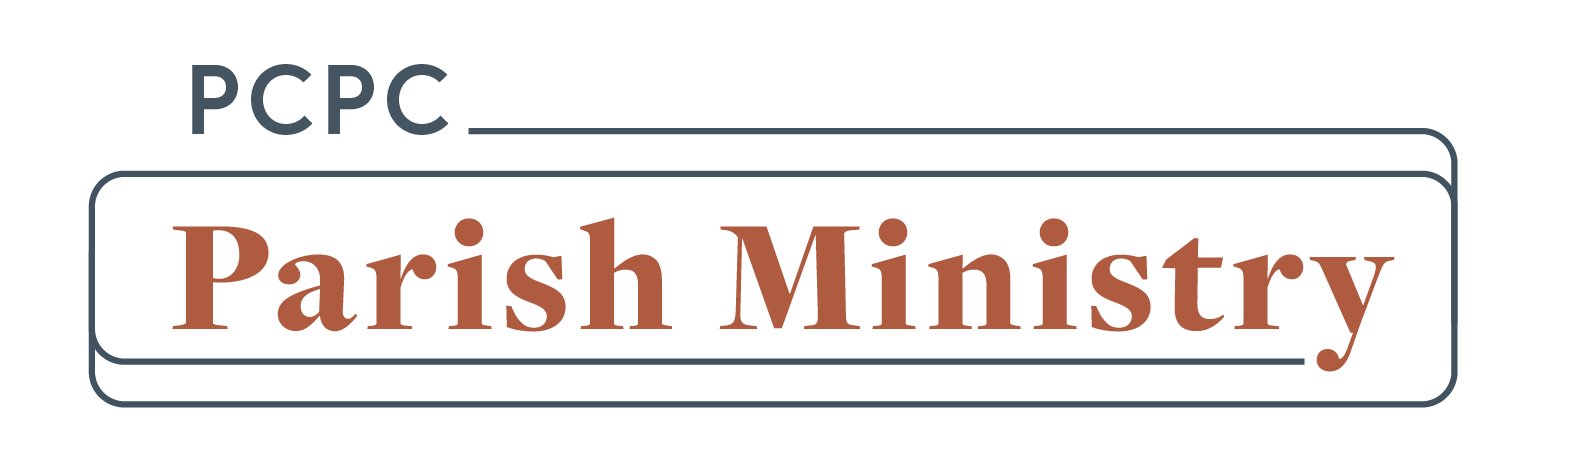 Parish Ministry Title